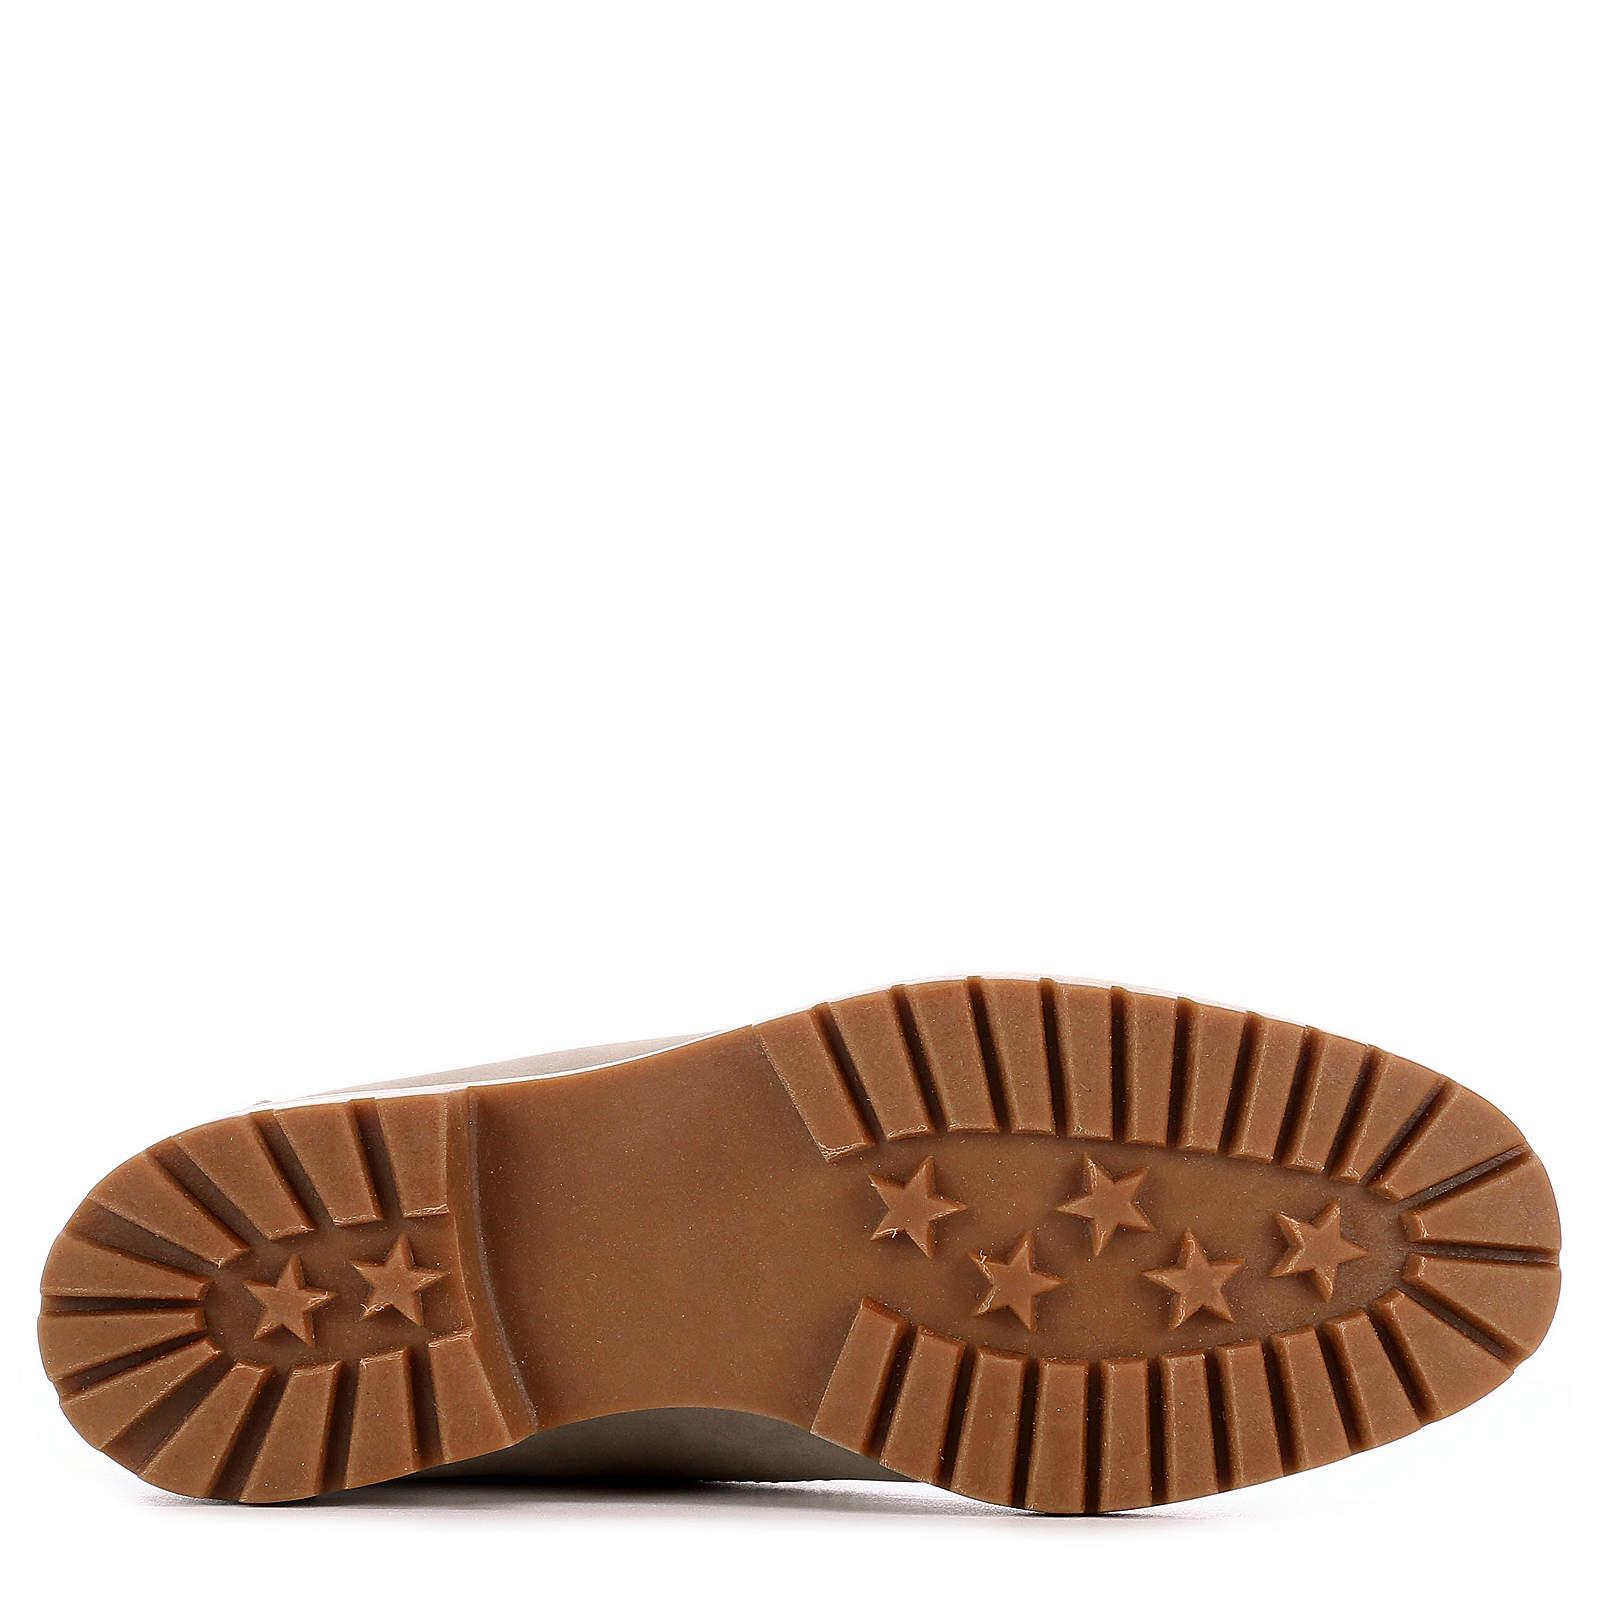 Limelight Damen Schuhe Brett Kunstleder Schnür Stiefel Schuhe Damen 6ffcd6